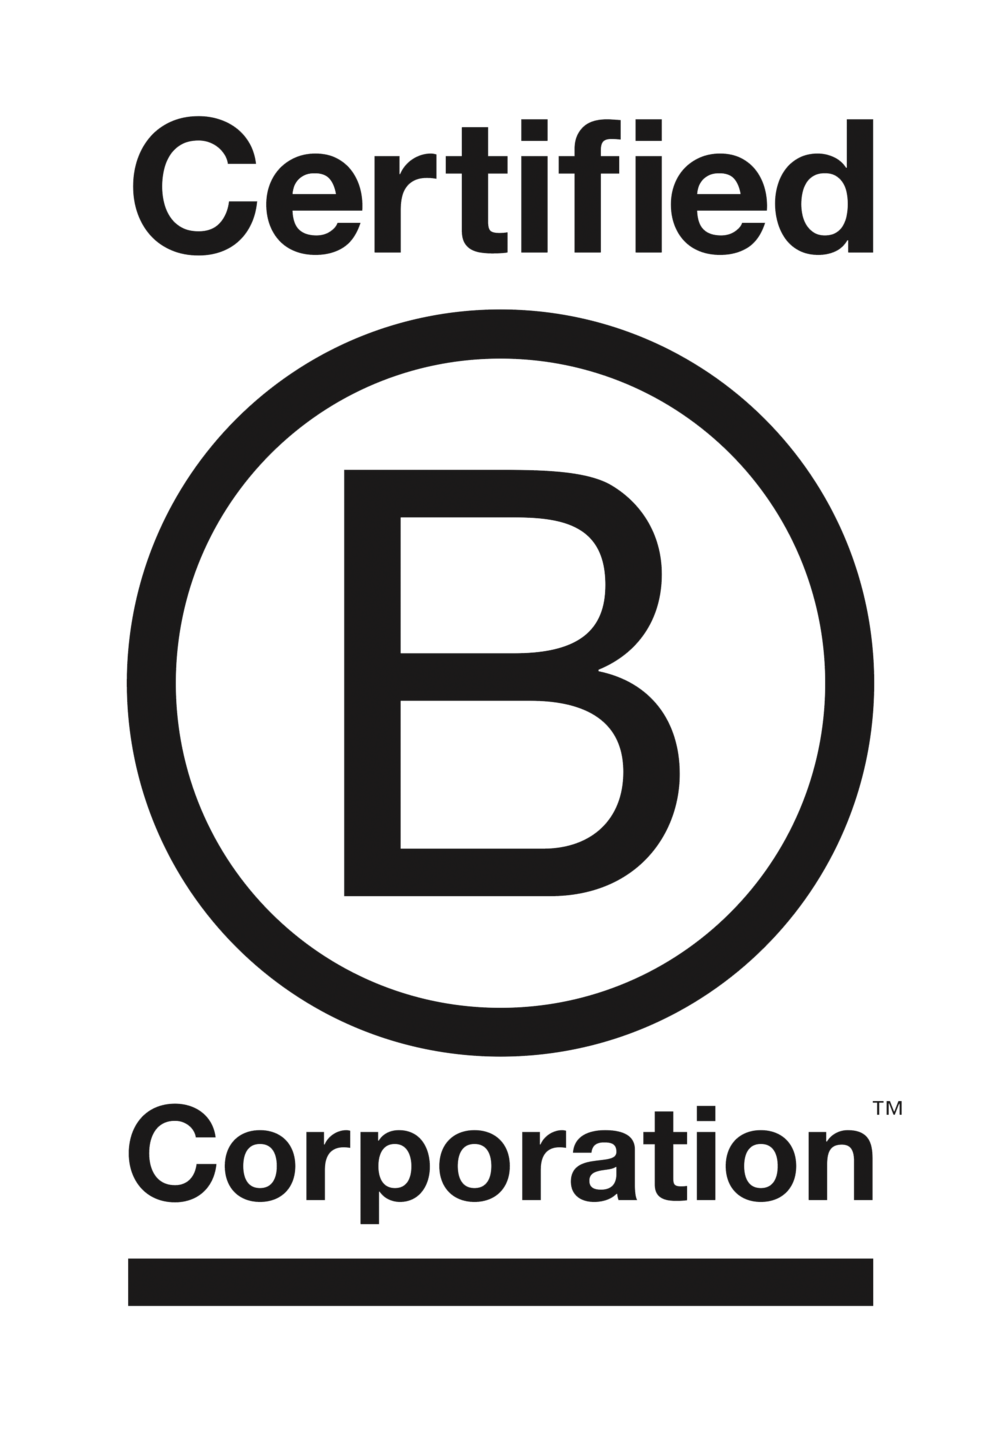 B-corp logo.png